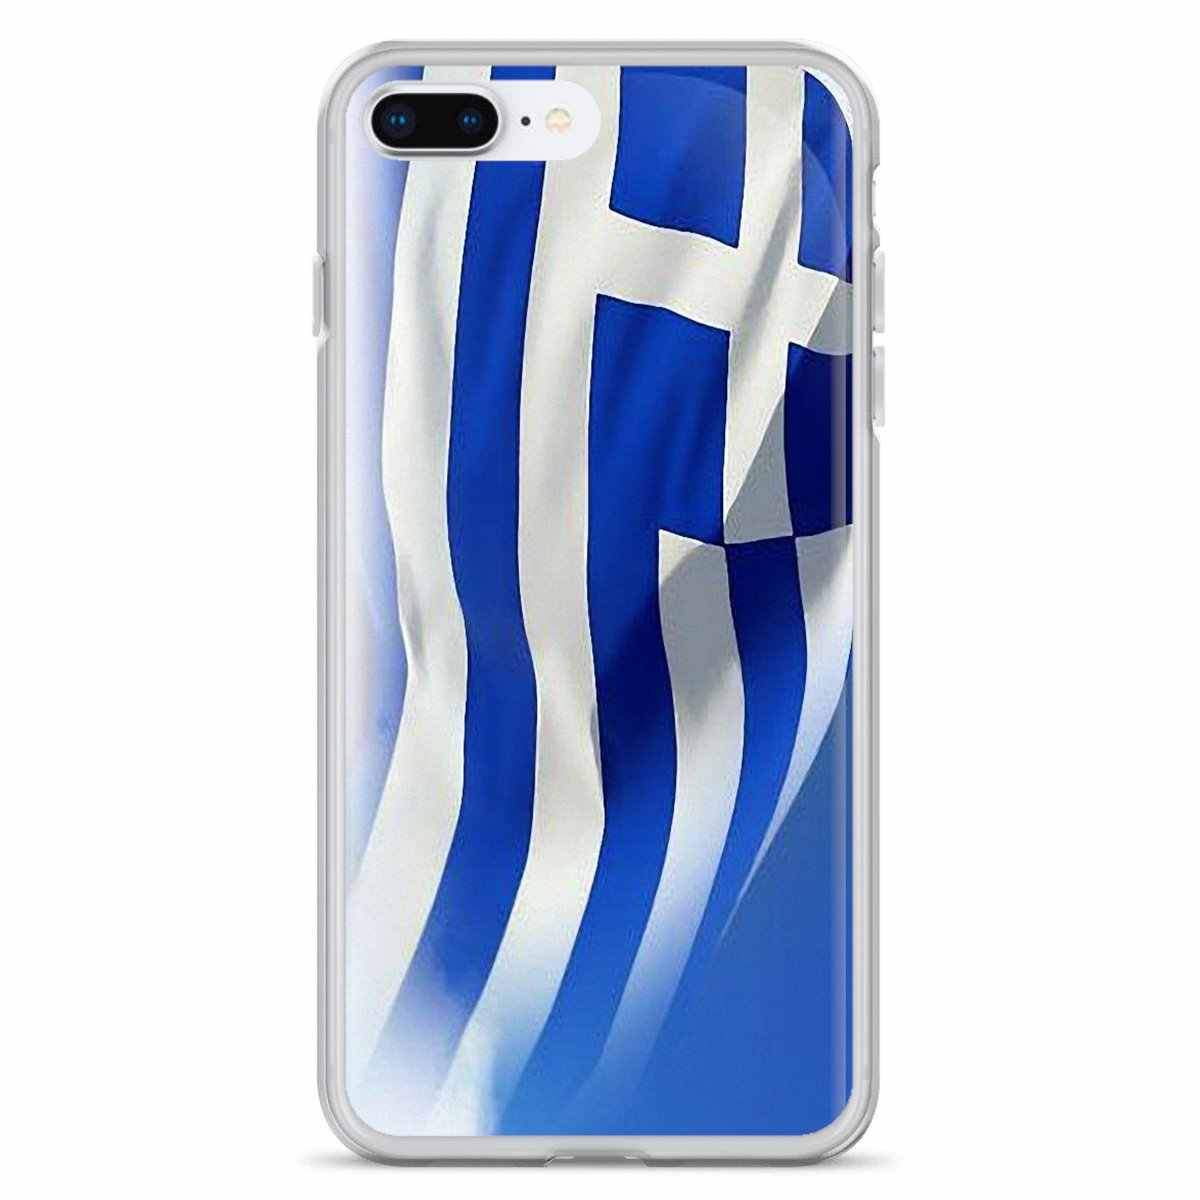 GR اليونانية اليونان العلم راية نمط لسامسونج غالاكسي A3 A5 A7 A9 A8 ستار لايت A6 زائد 2018 2015 2016 2017 لينة بولي Covers يغطي